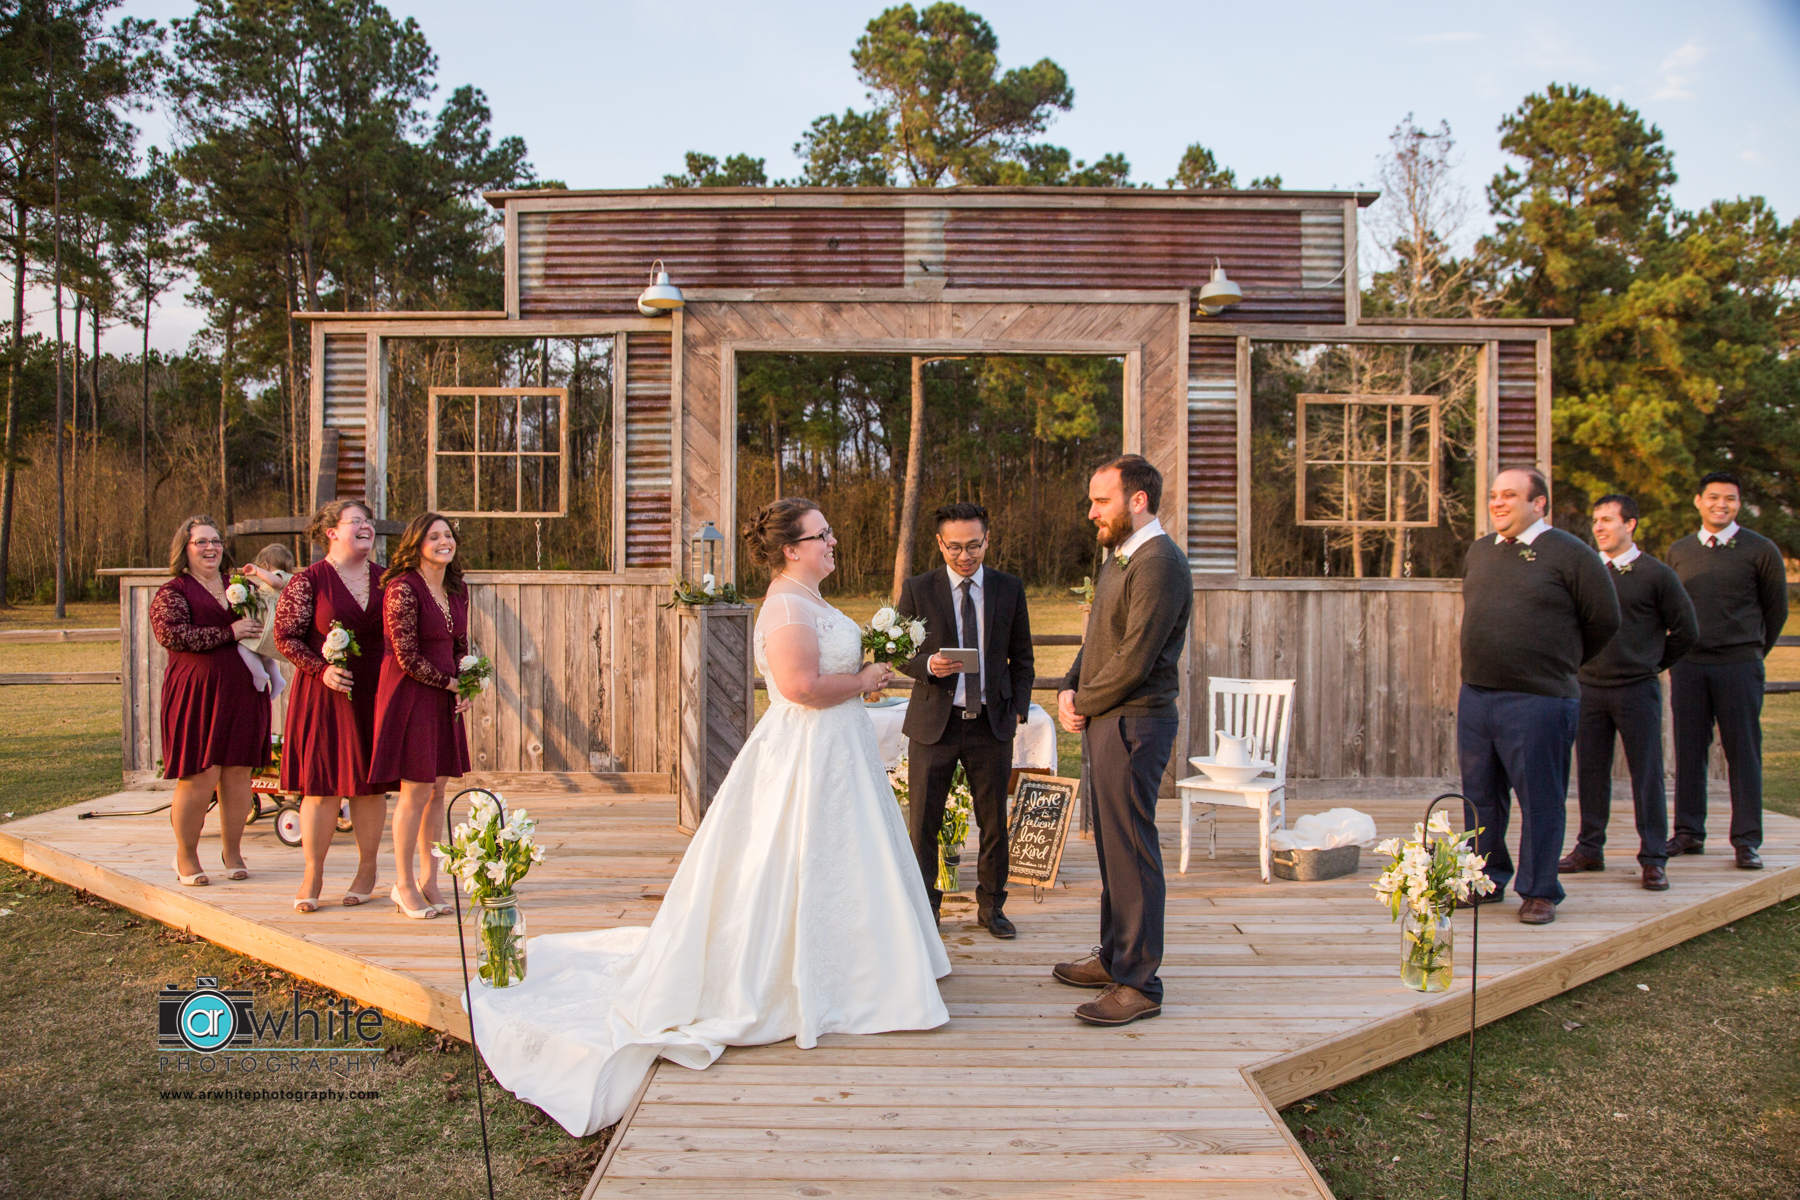 Wedding ceremony on a farm wedding and event barn venue.